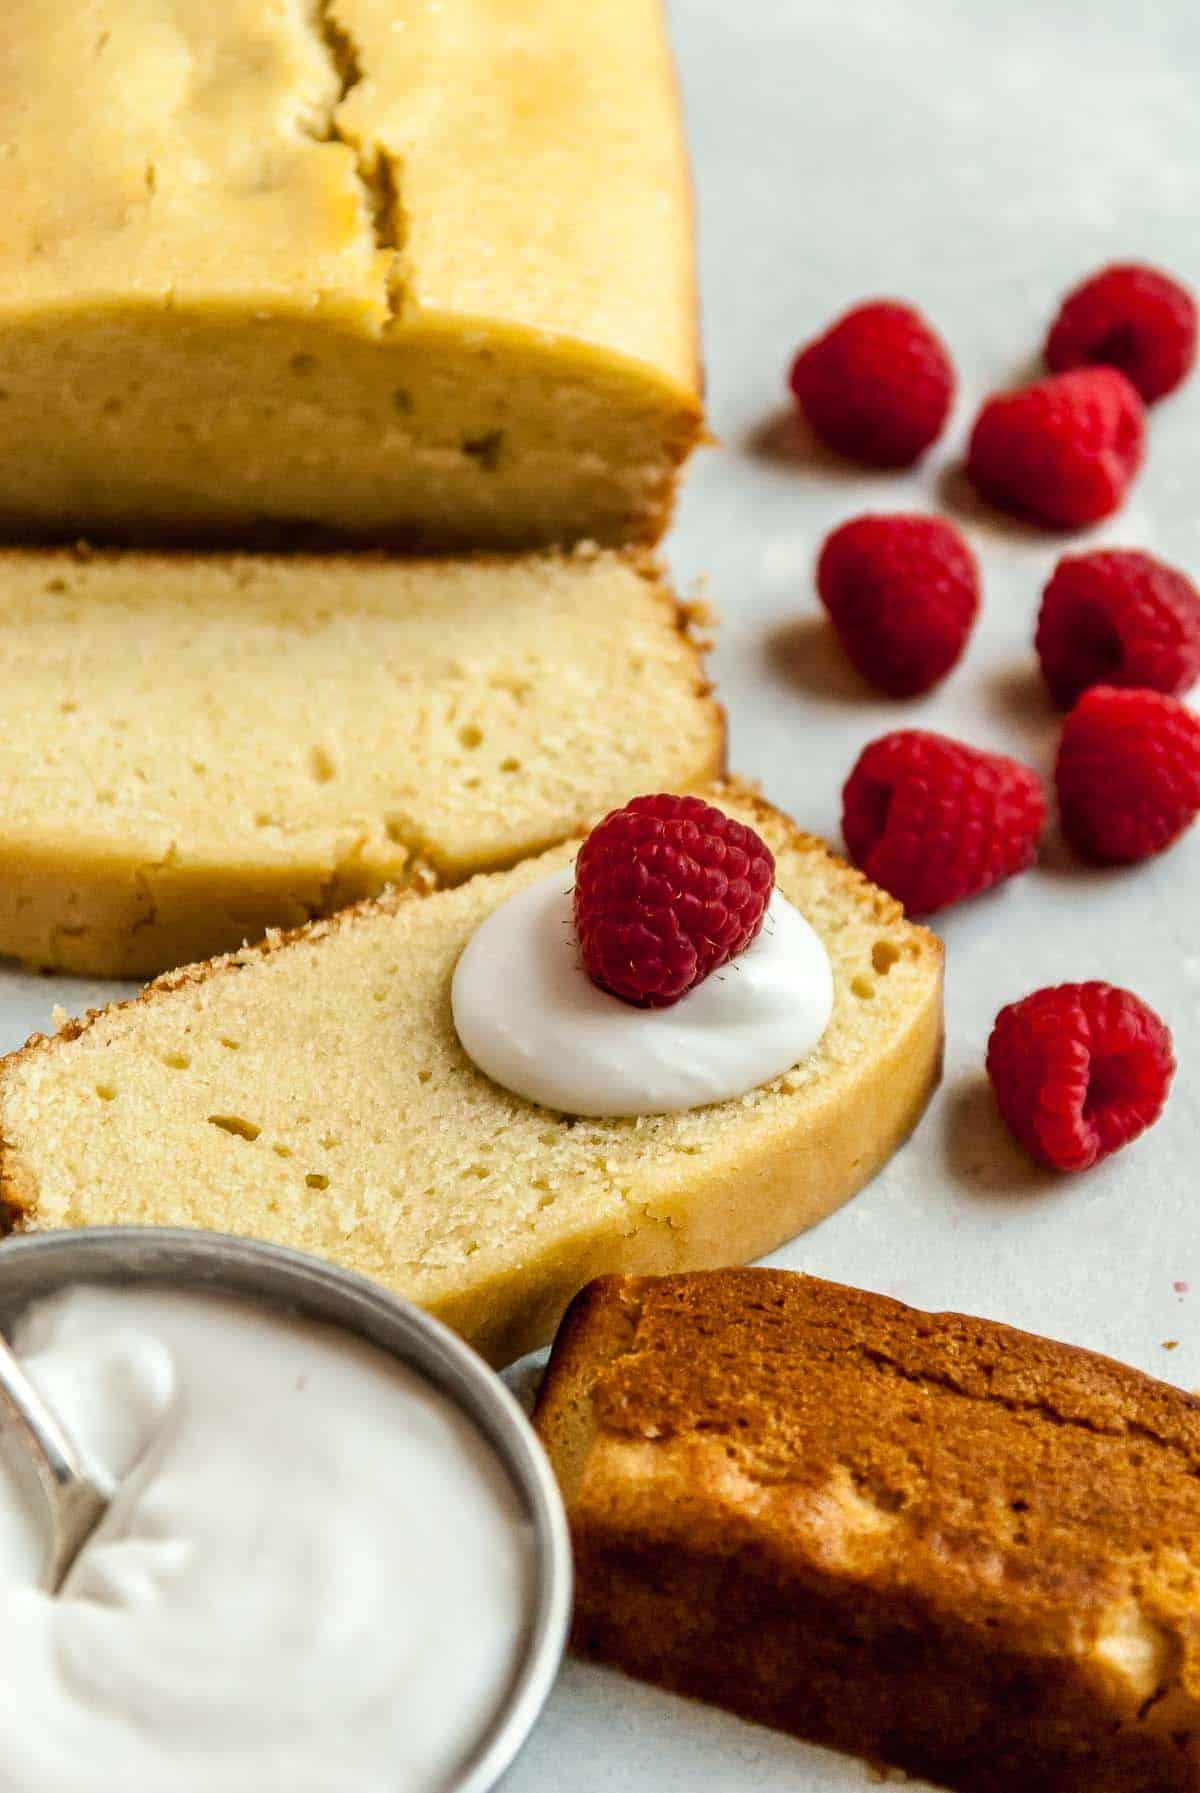 slices of vegan pound cake and raspberries